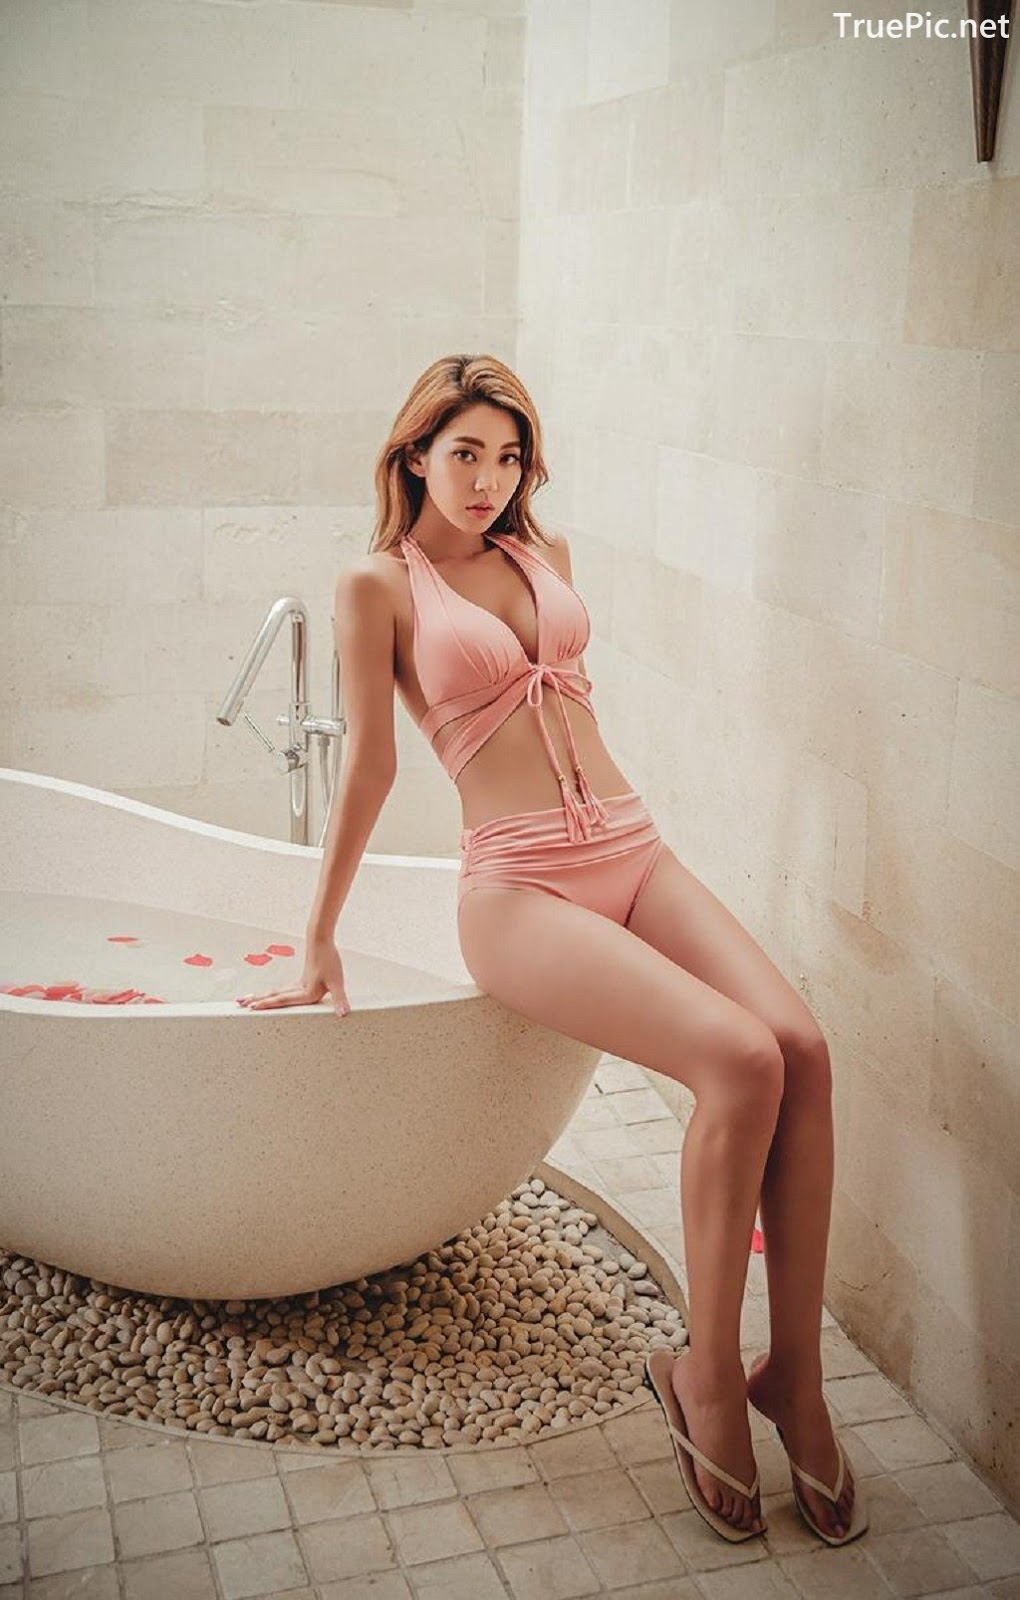 Image Lee Chae Eun - Bucket Pink Bikini - Korean Fashion Model - TruePic.net - Picture-9